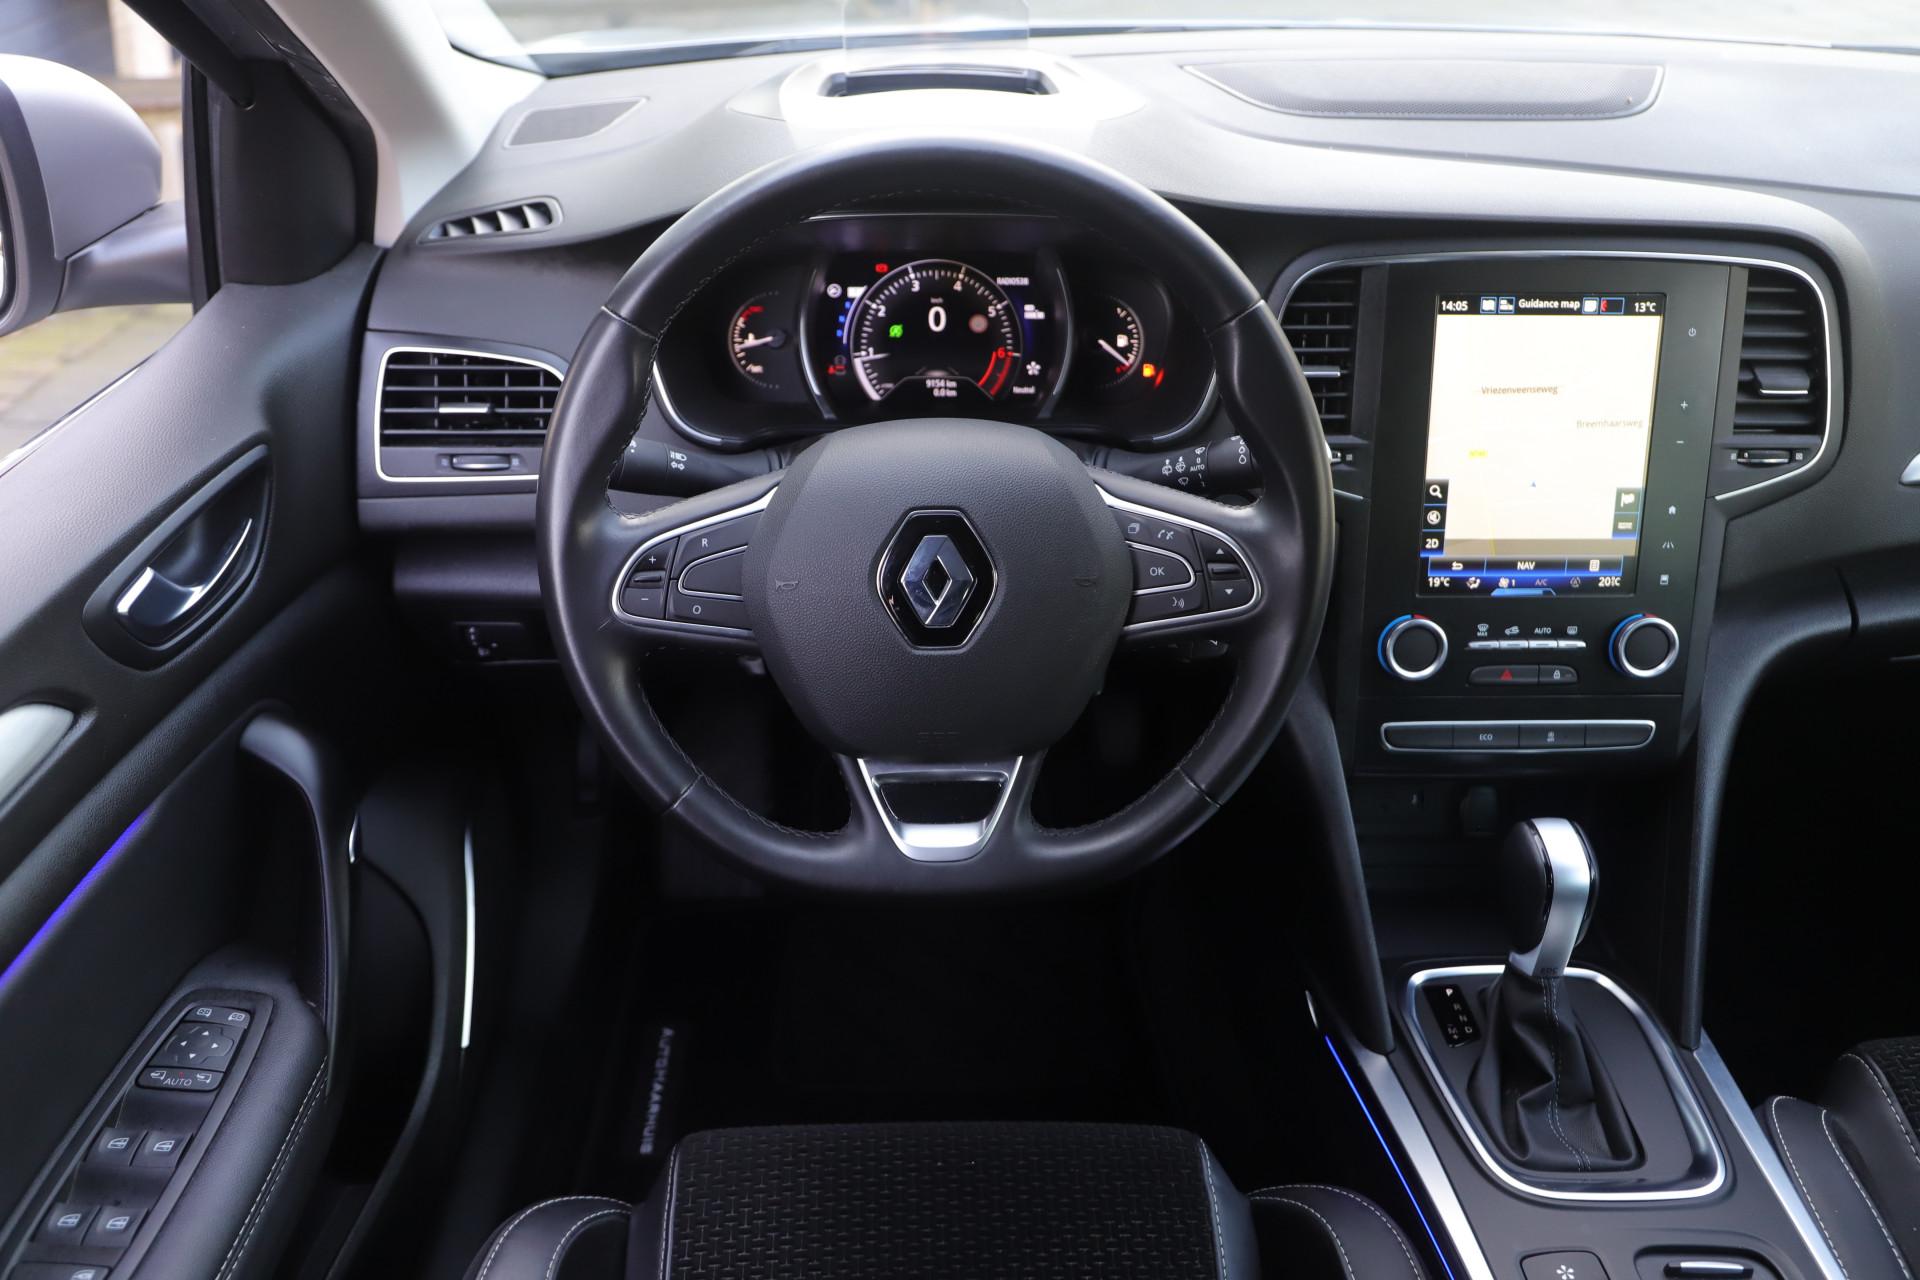 Tweedehands Renault Megane GT-Line occasion